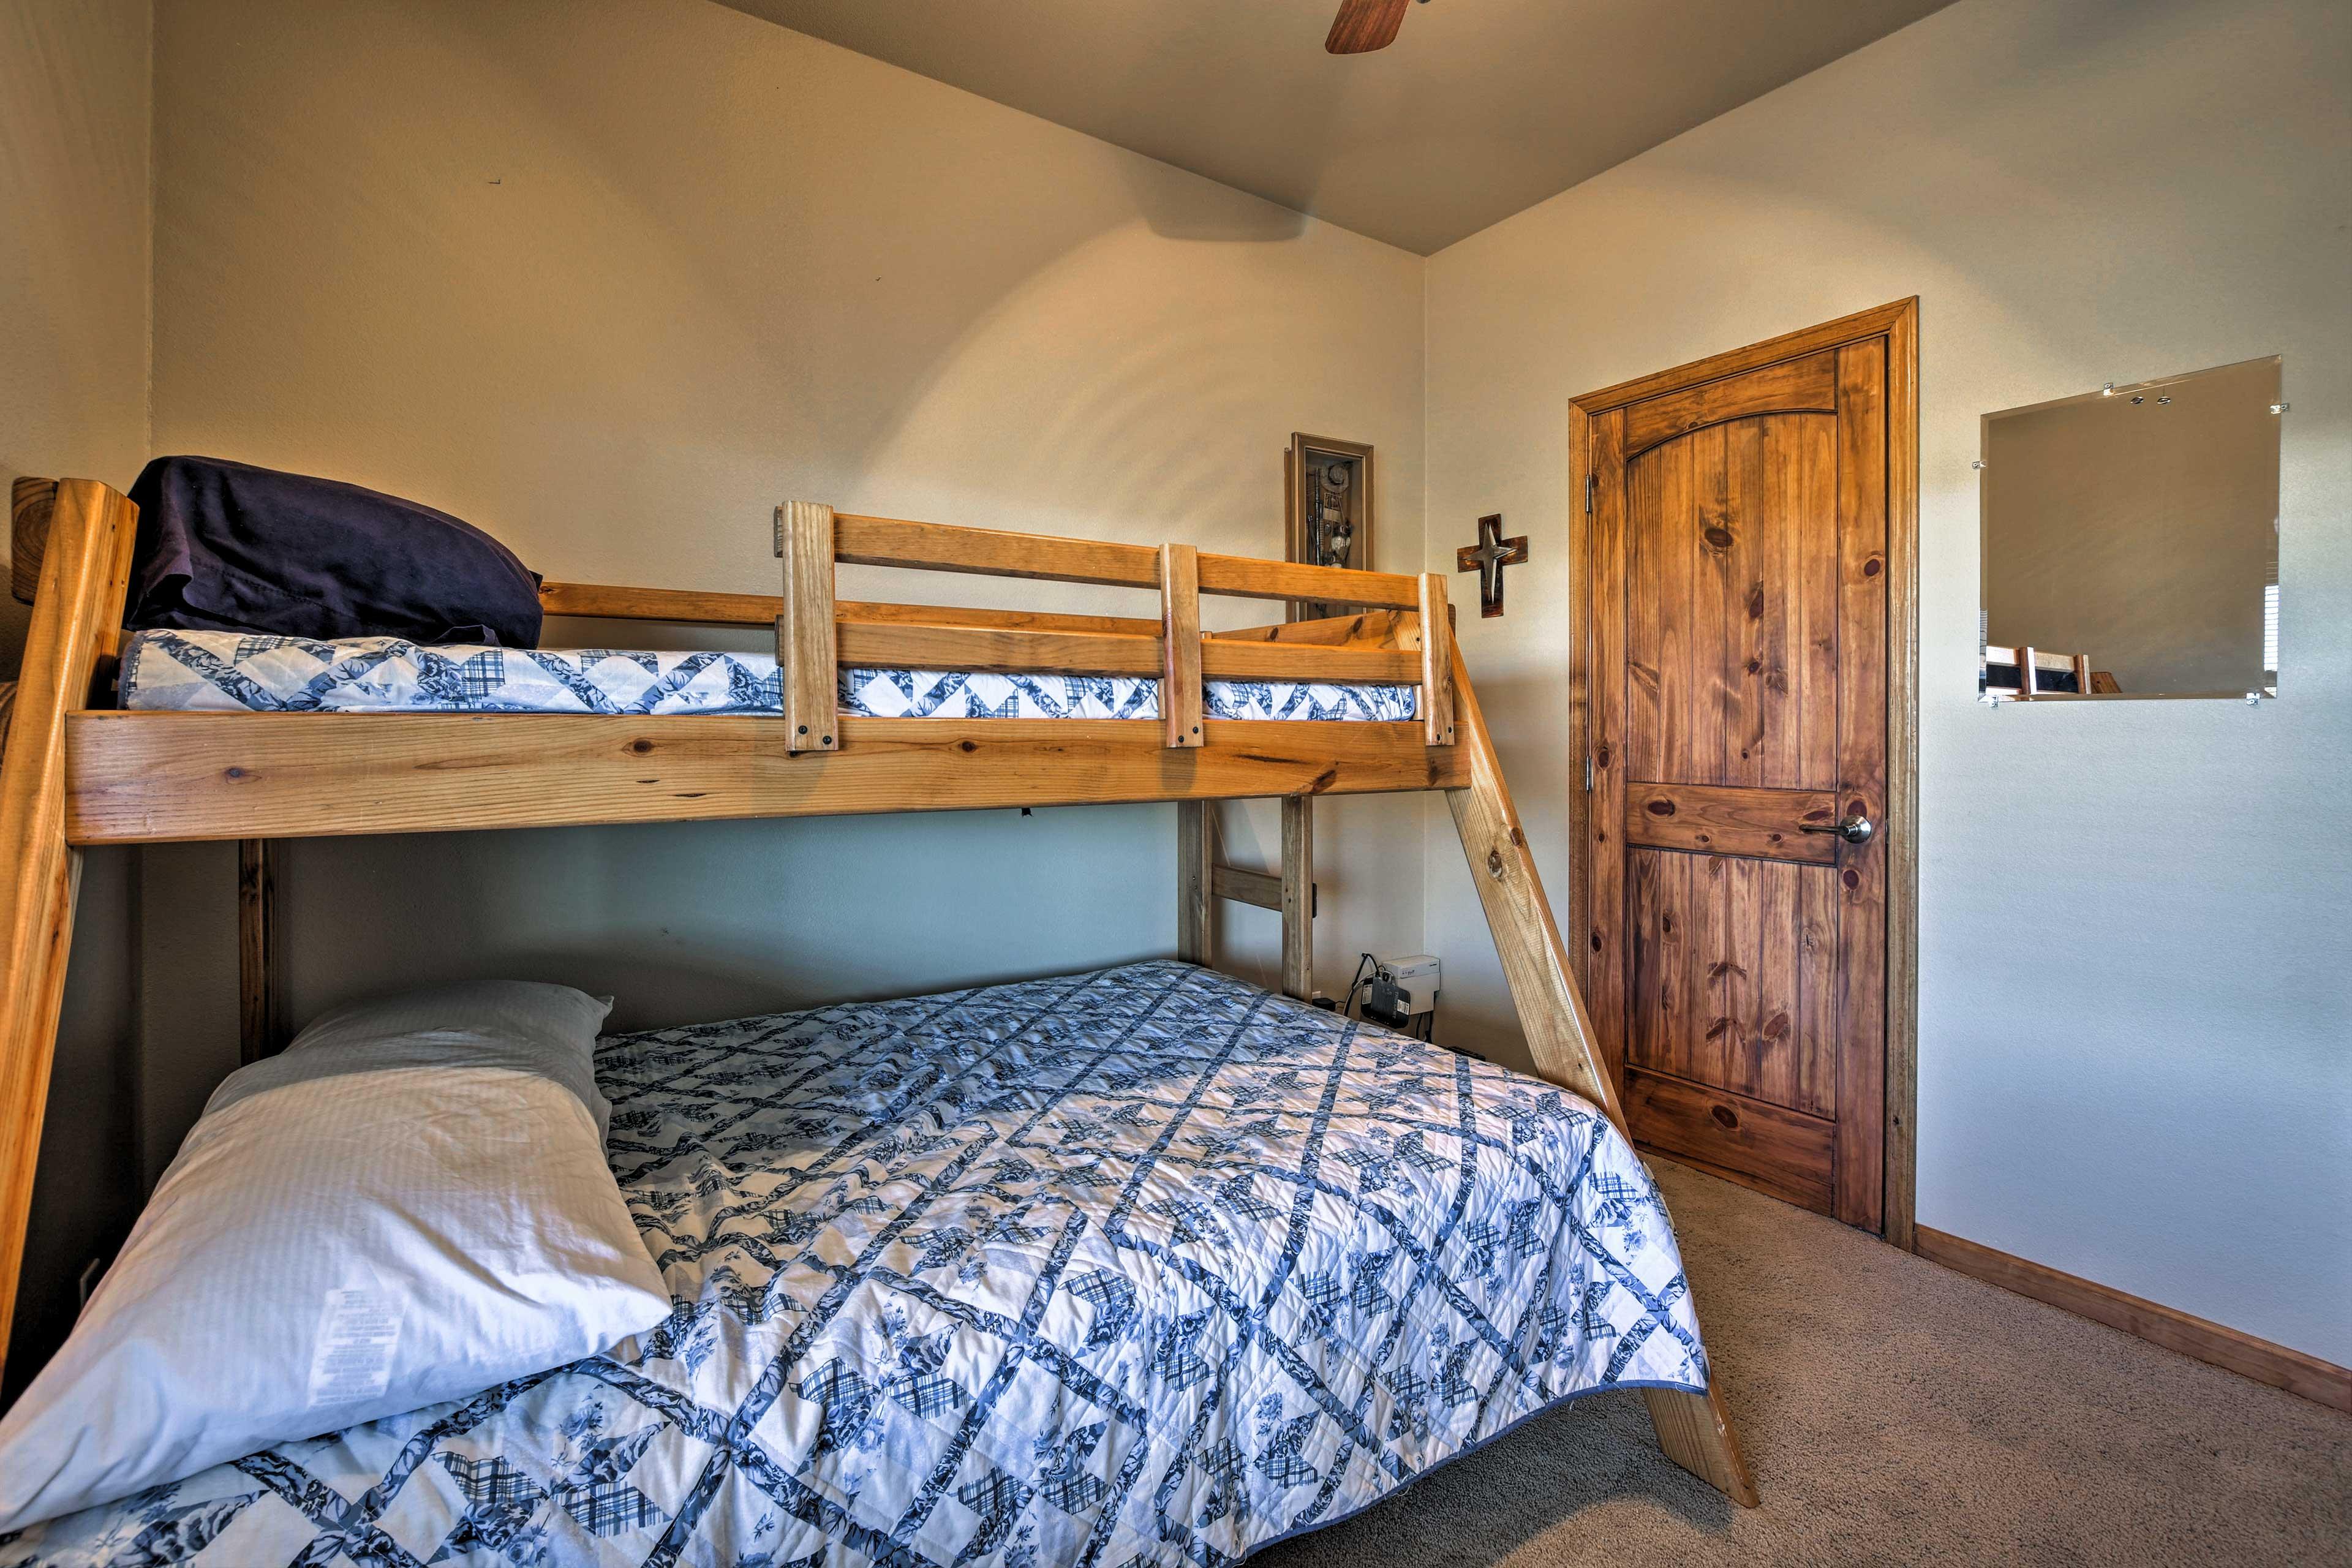 Each guest bedroom sleeps 3 guests.